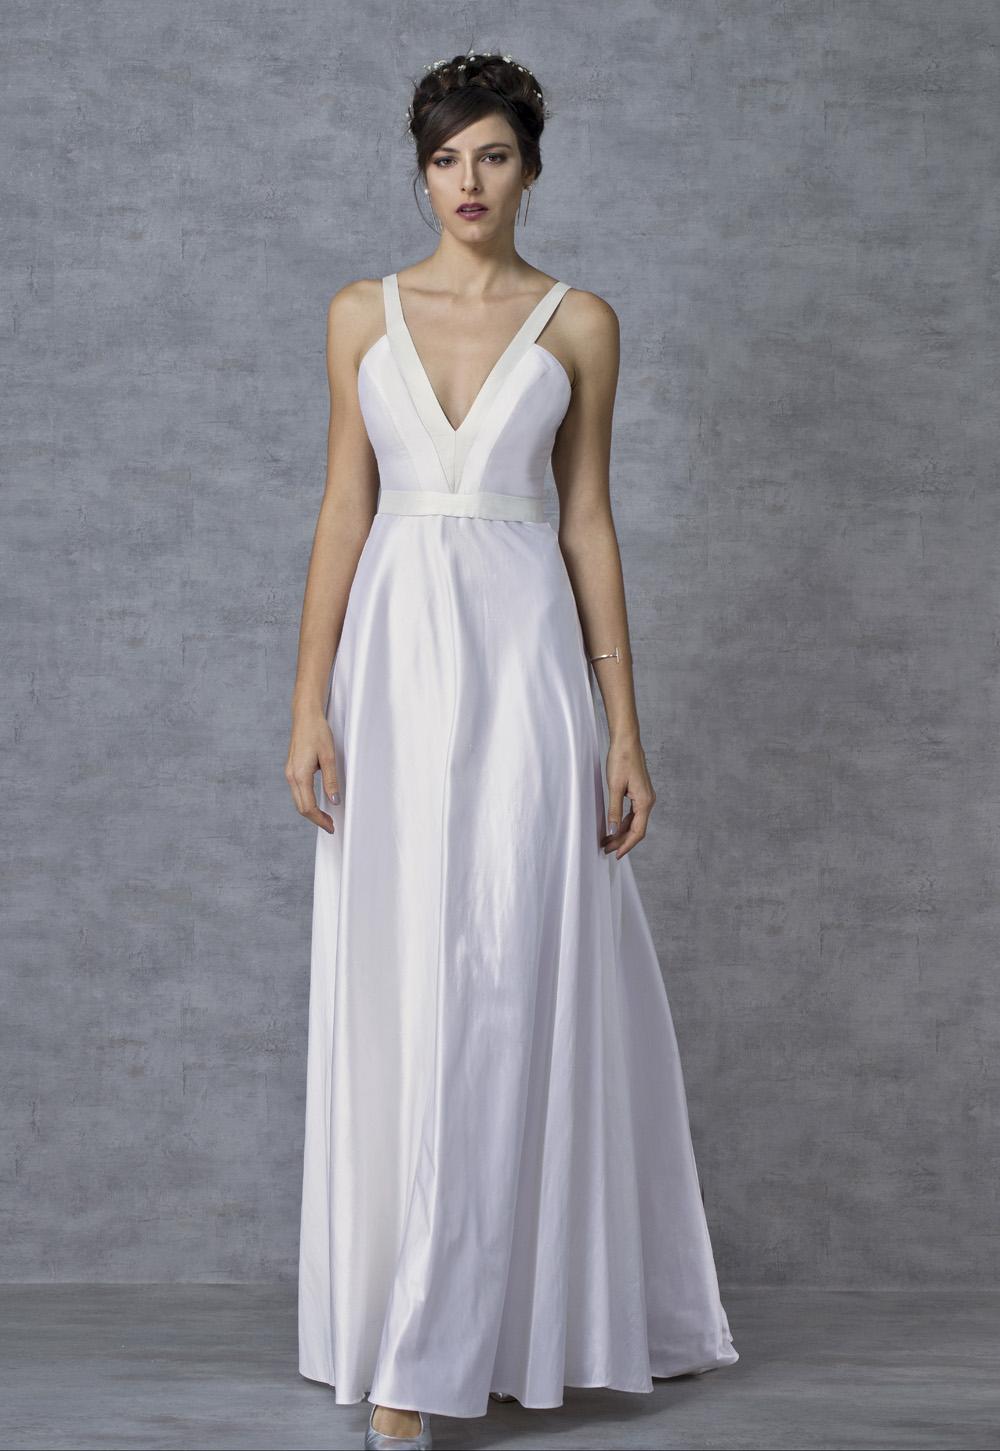 I3A8828 שמלות כלה - שמלה